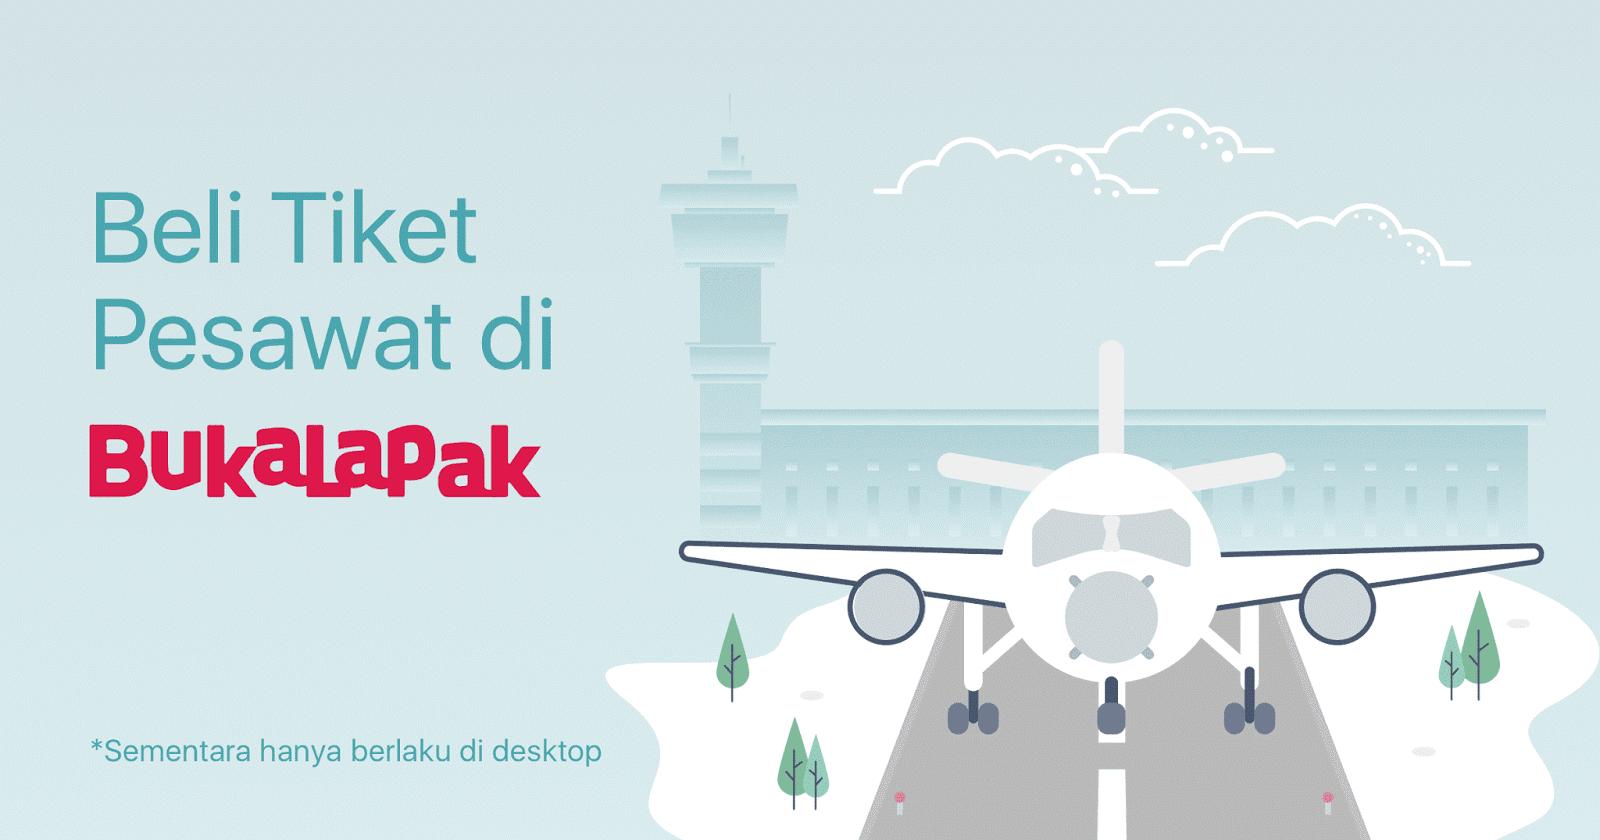 Jual Online Tiket Pesawat